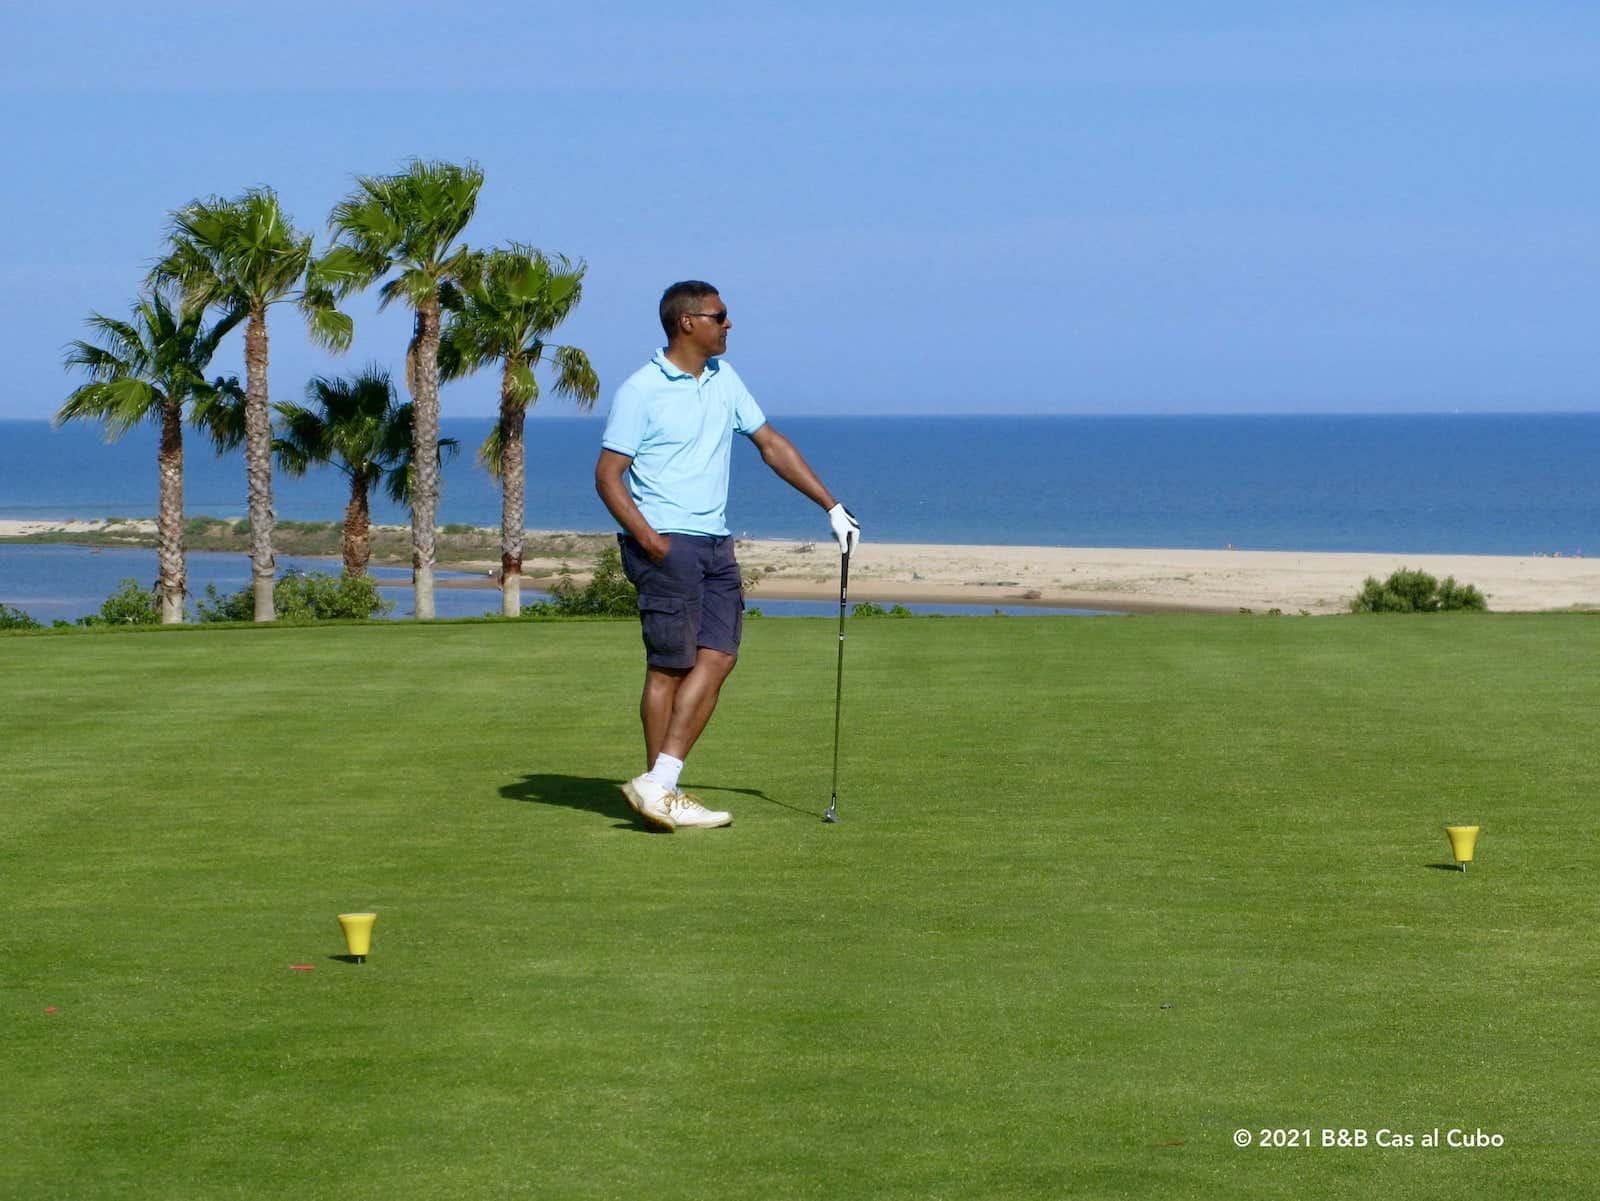 Golfer op de green van Quinta da Ria golfbaan